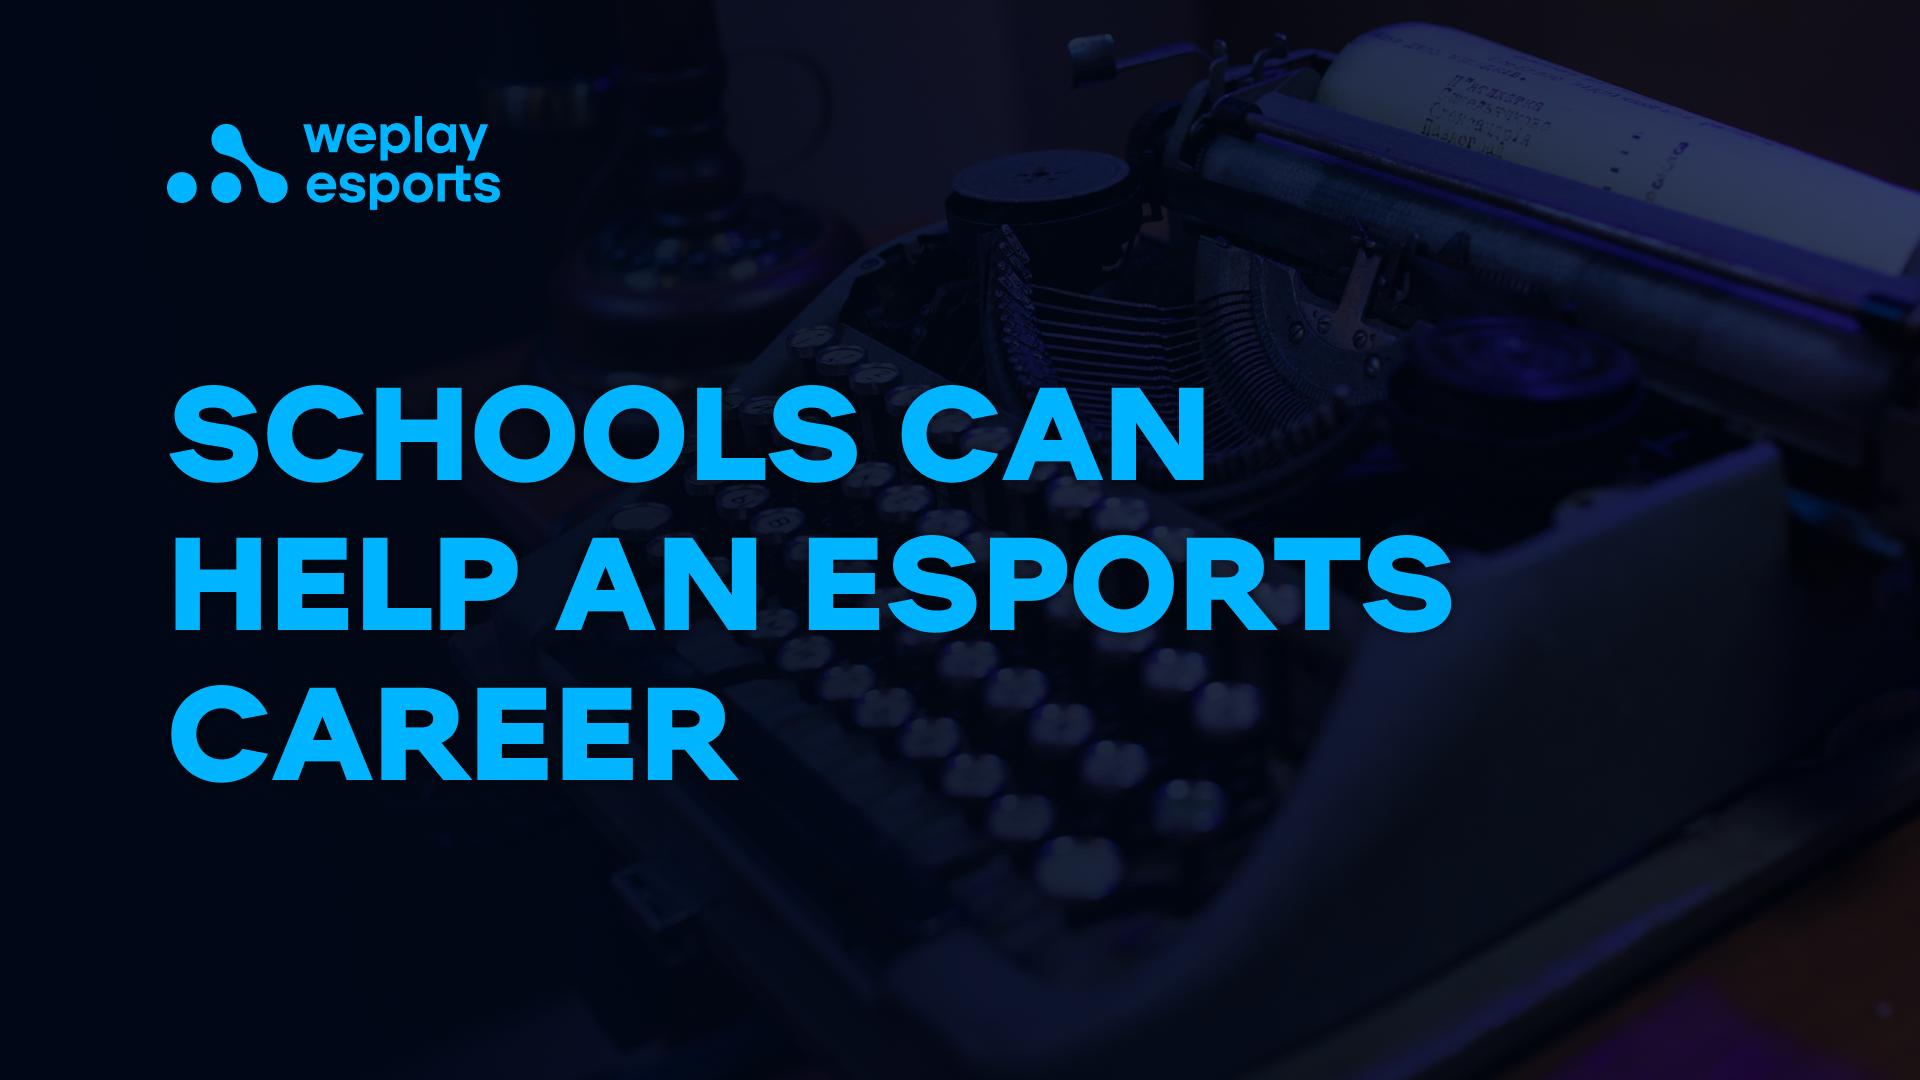 School can help an esports career